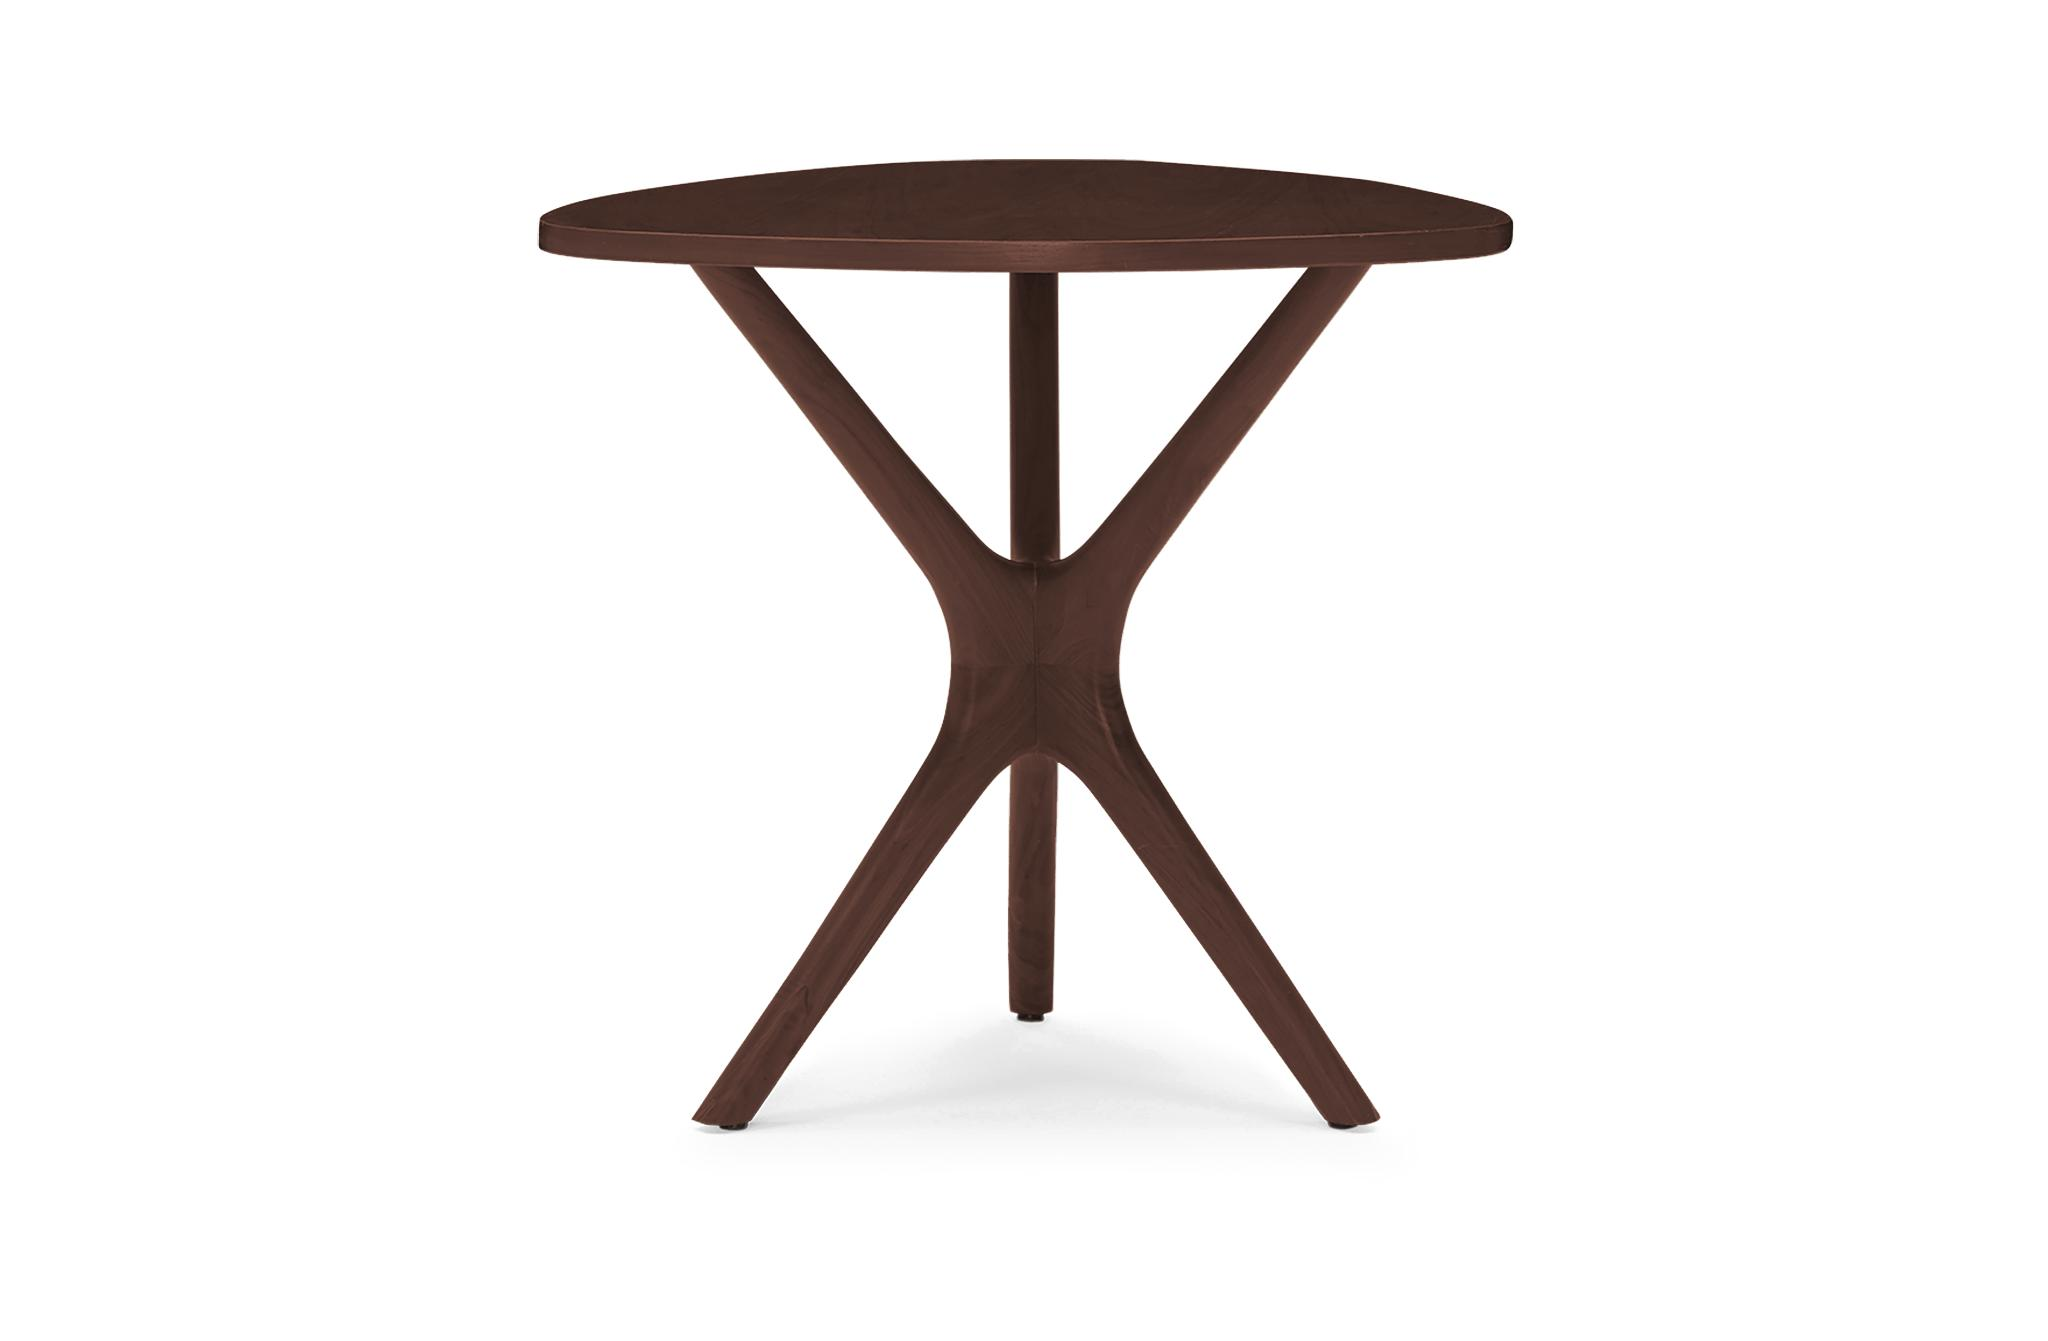 Tolson Mid Century Modern (Wood Top) End Table - Walnut